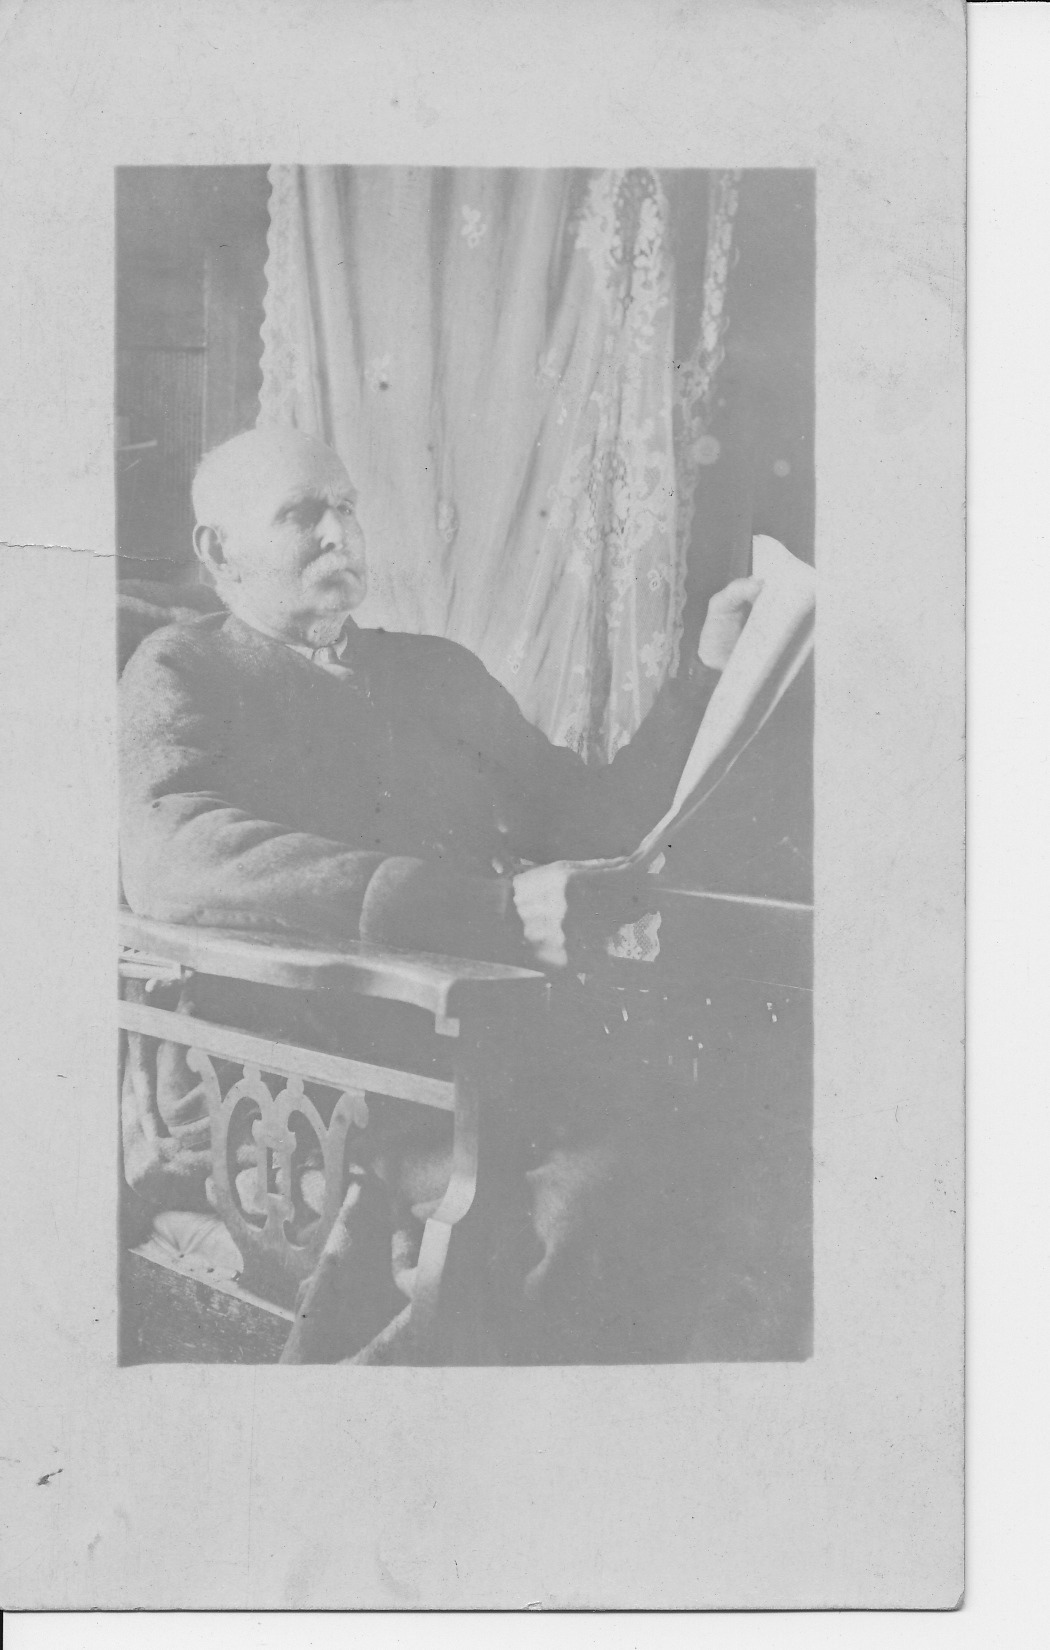 Sylvester Brokaw